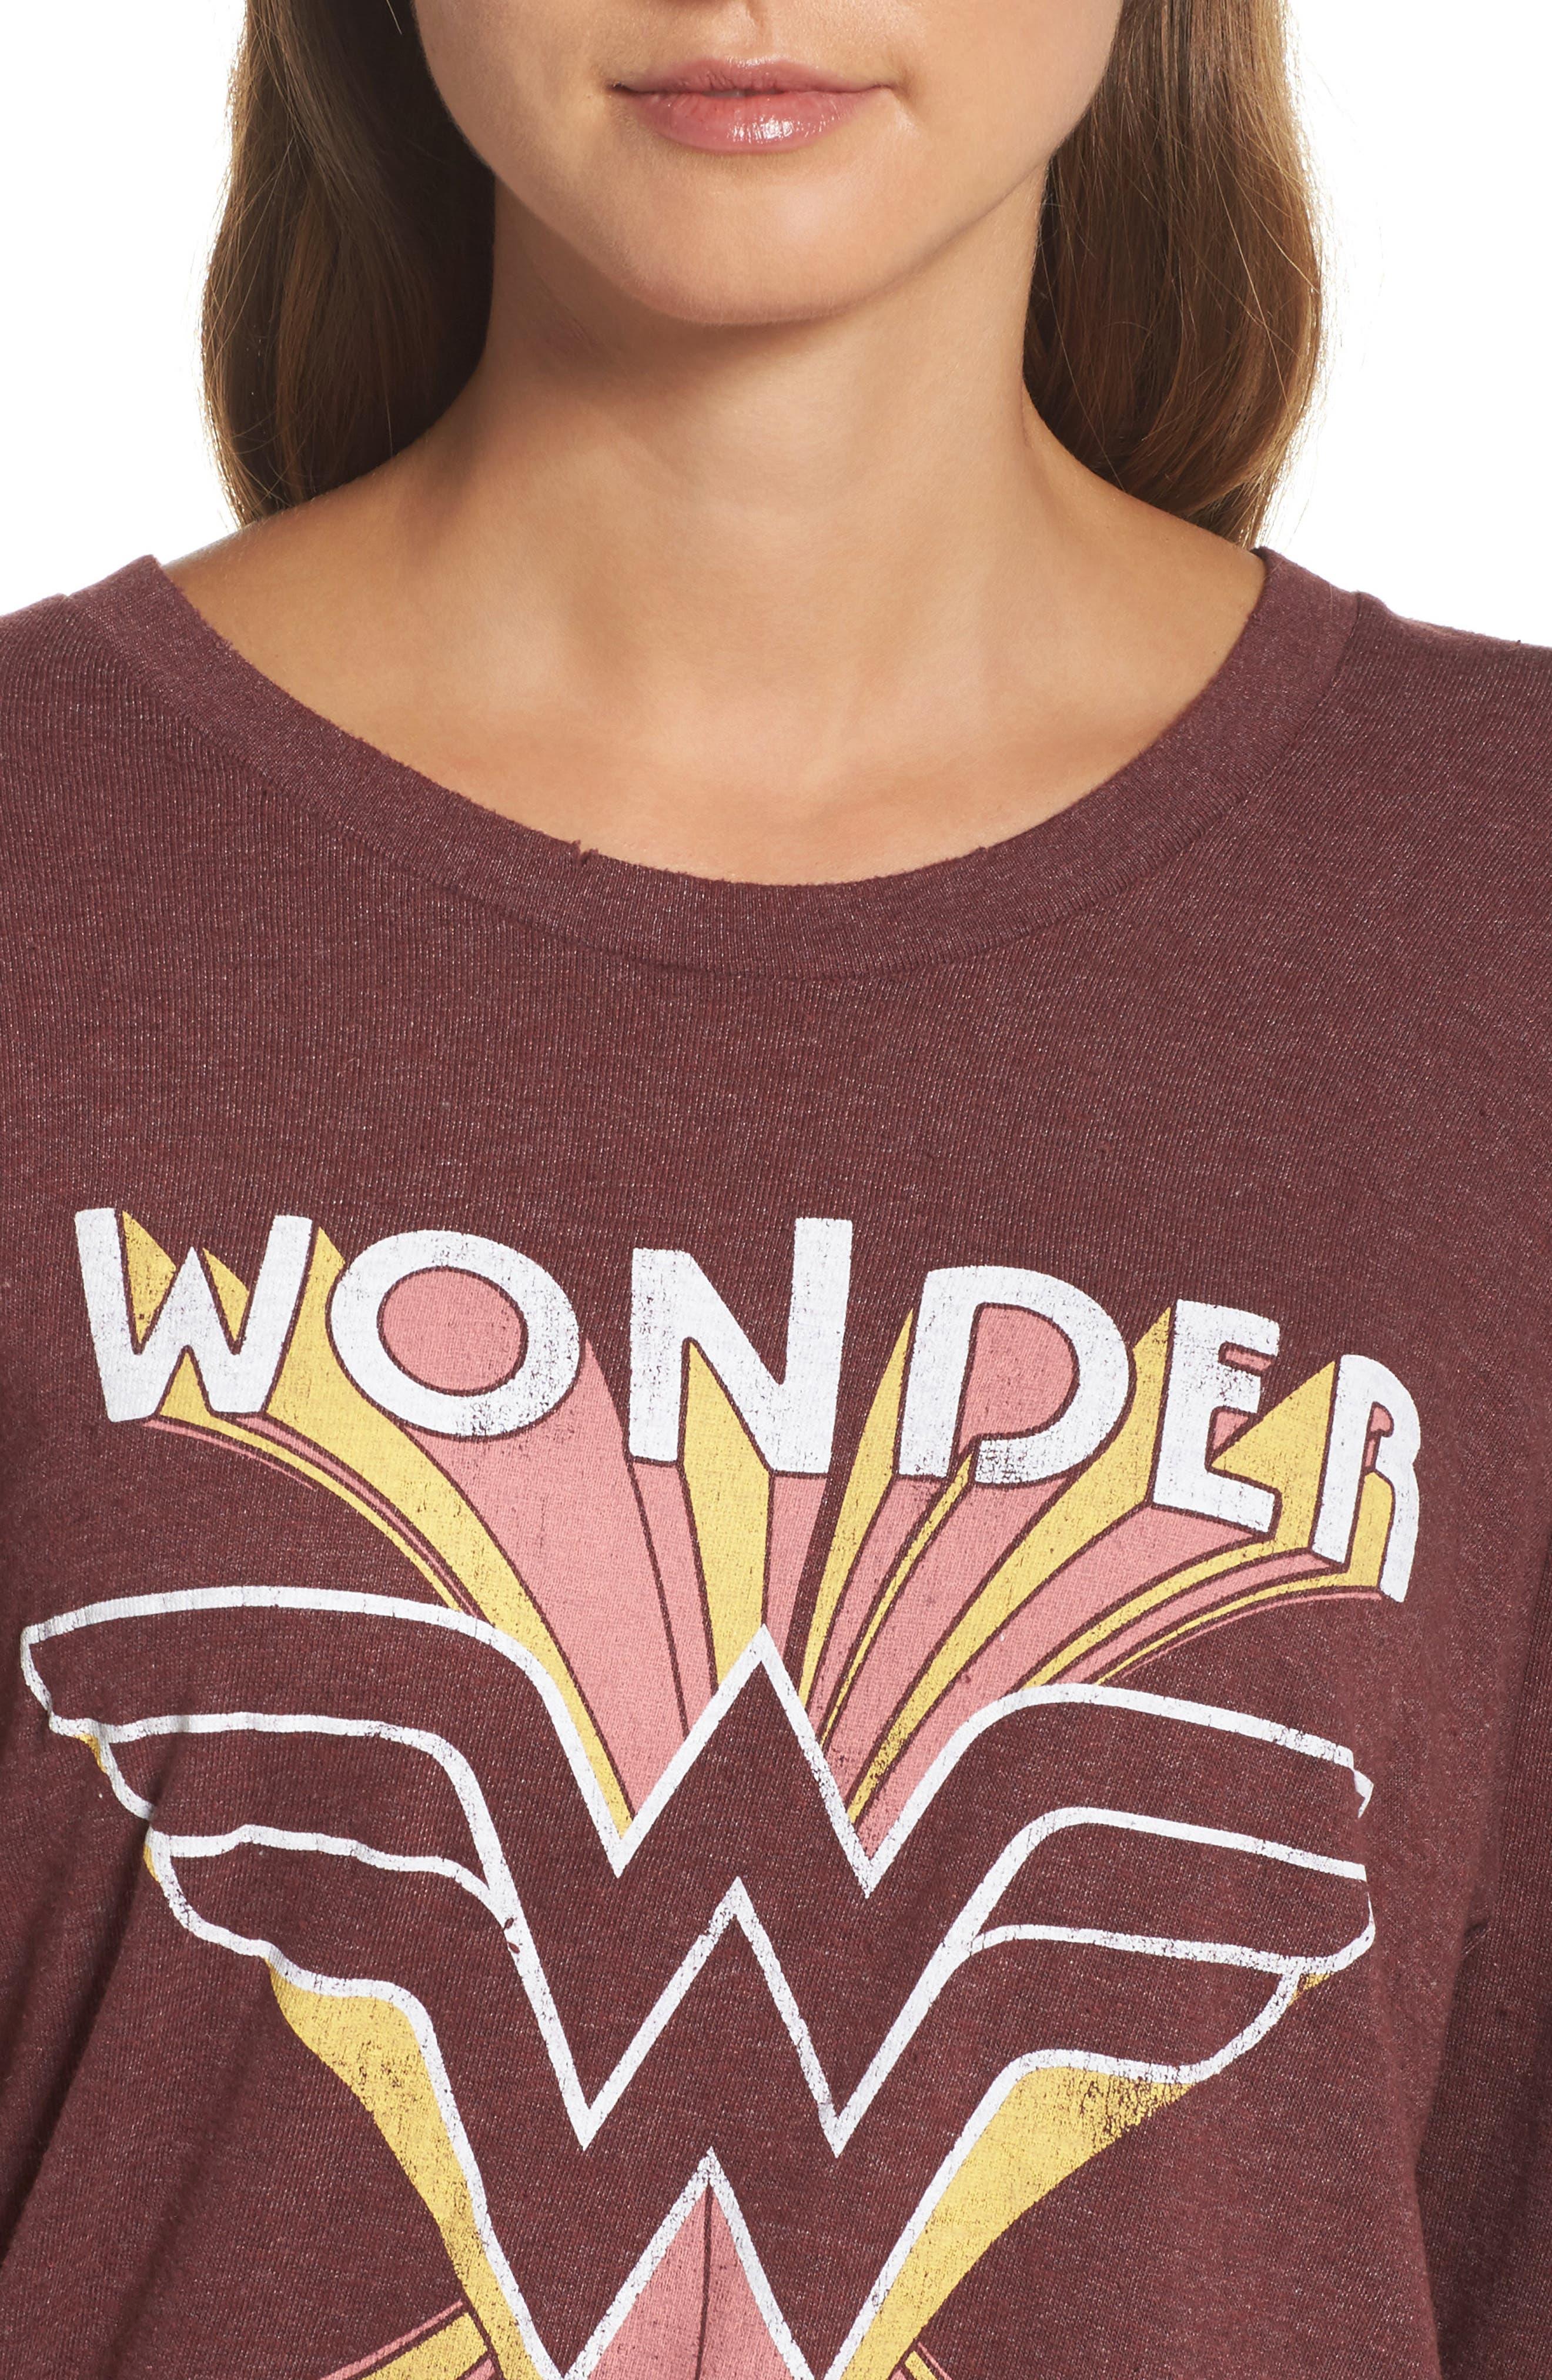 Wonder Woman Sweatshirt,                             Alternate thumbnail 4, color,                             930